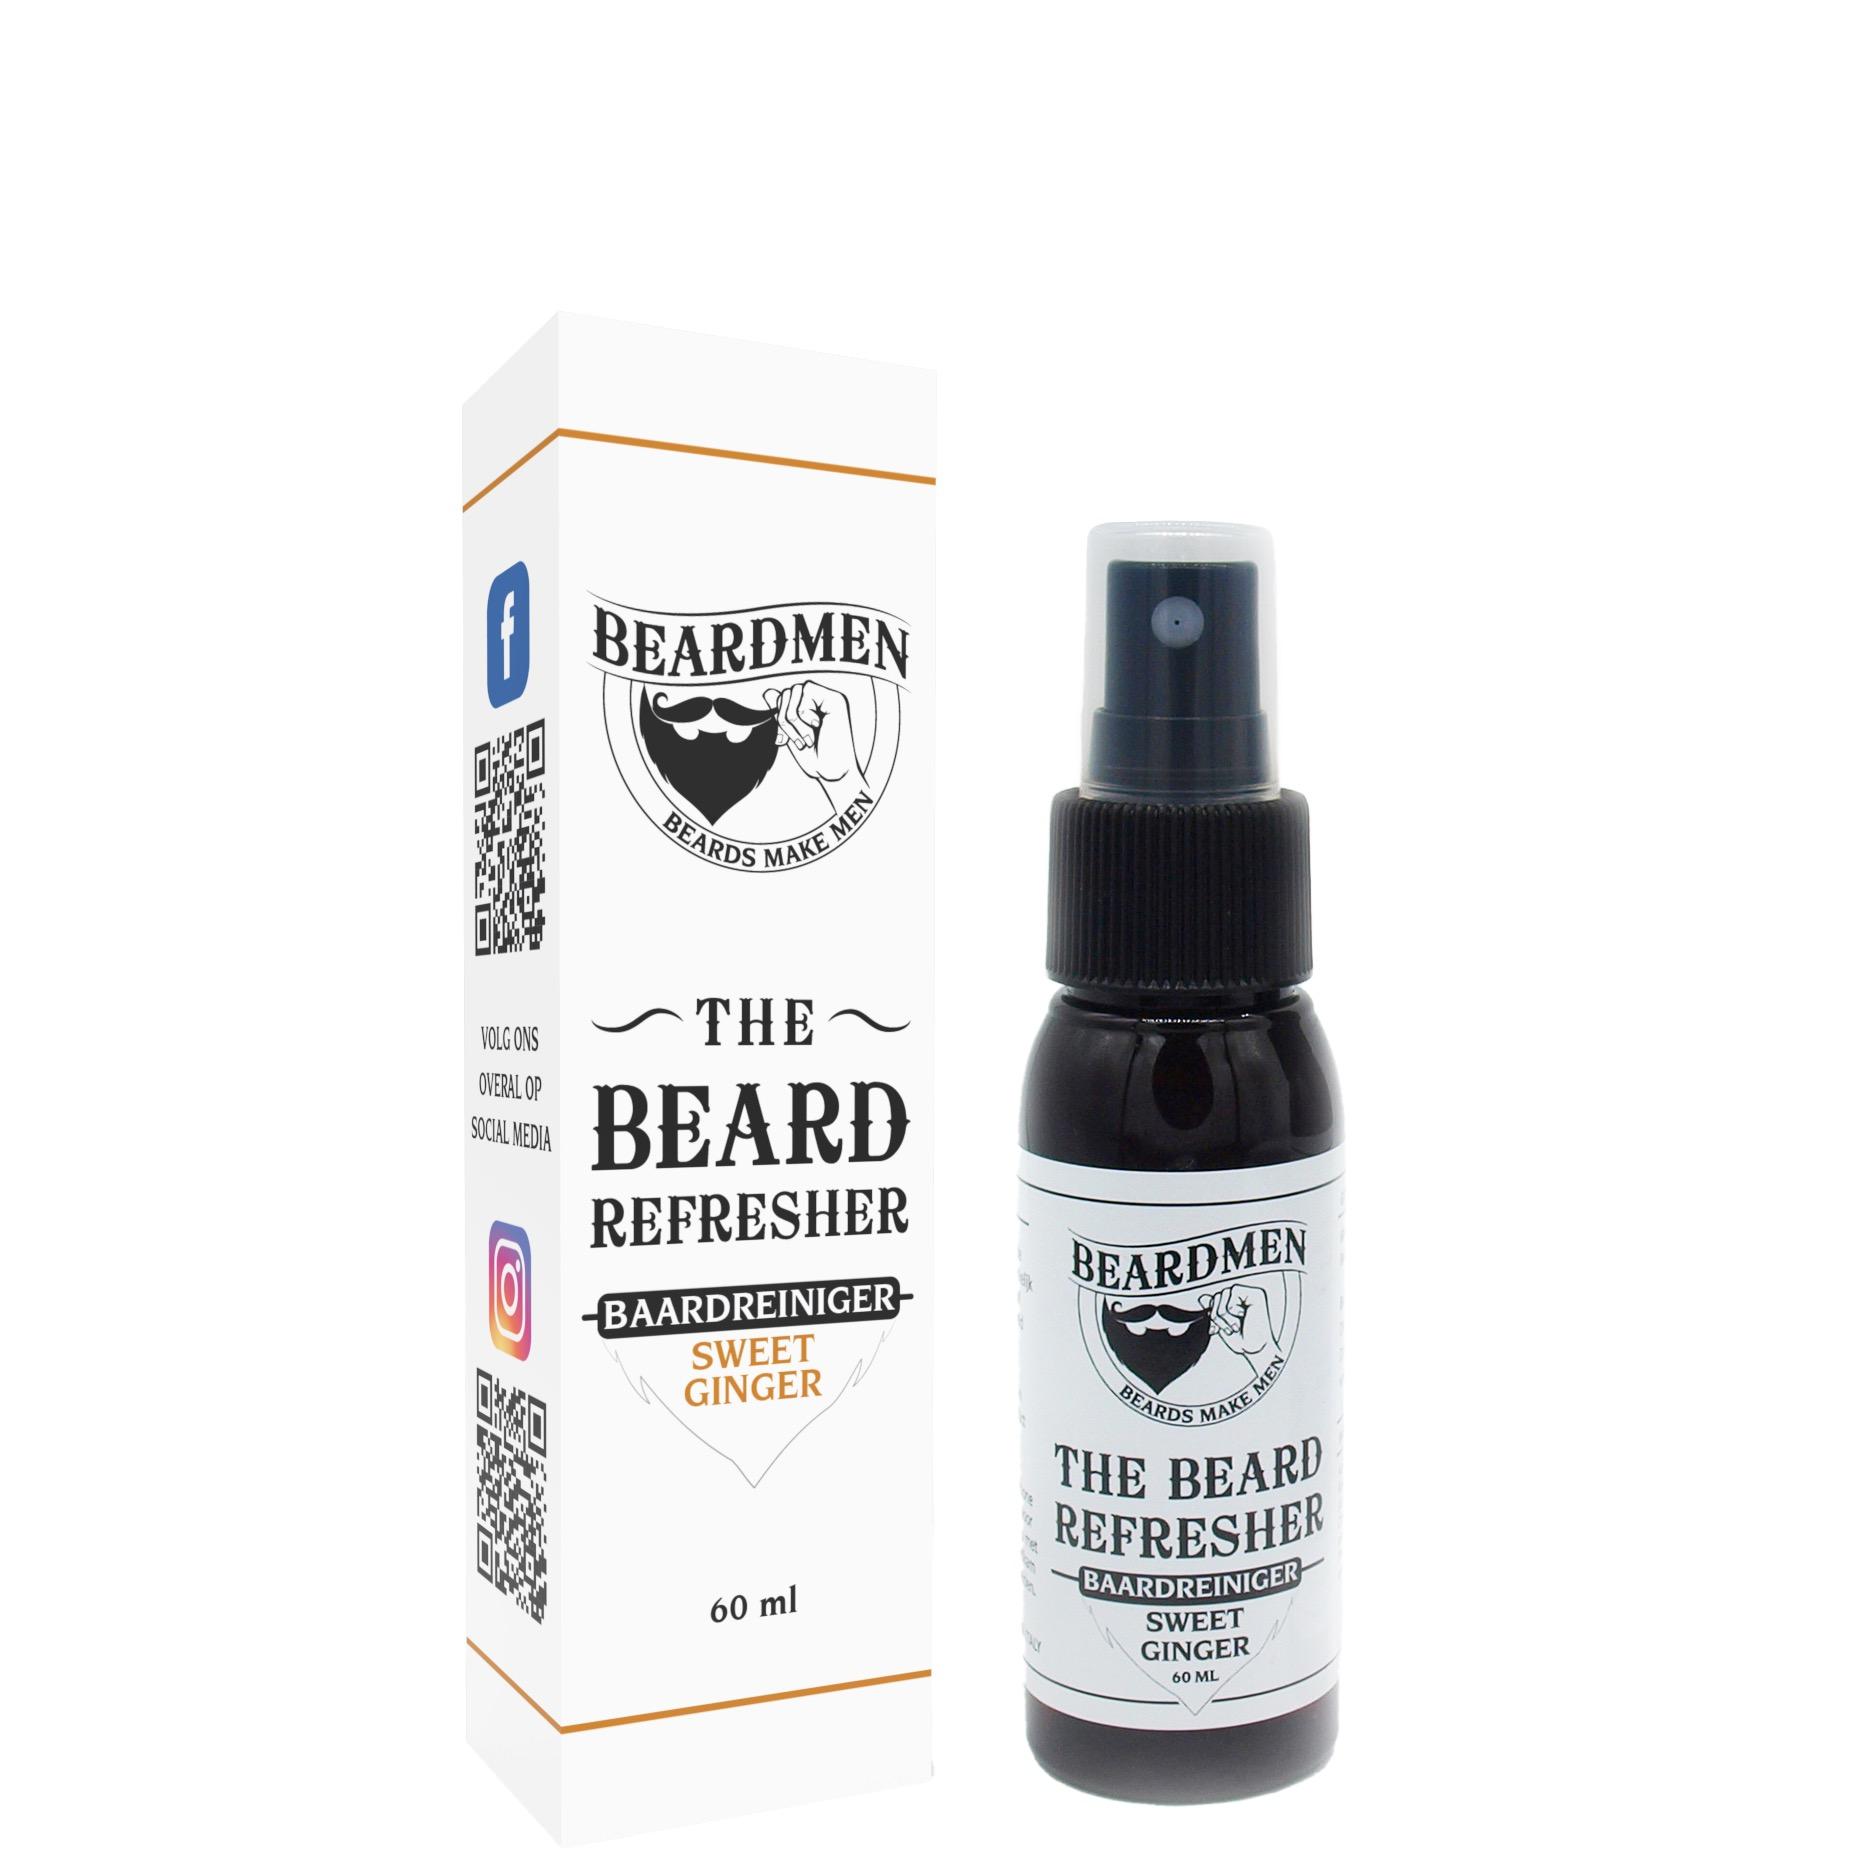 Beardmen Baardreiniger Sweet Ginger